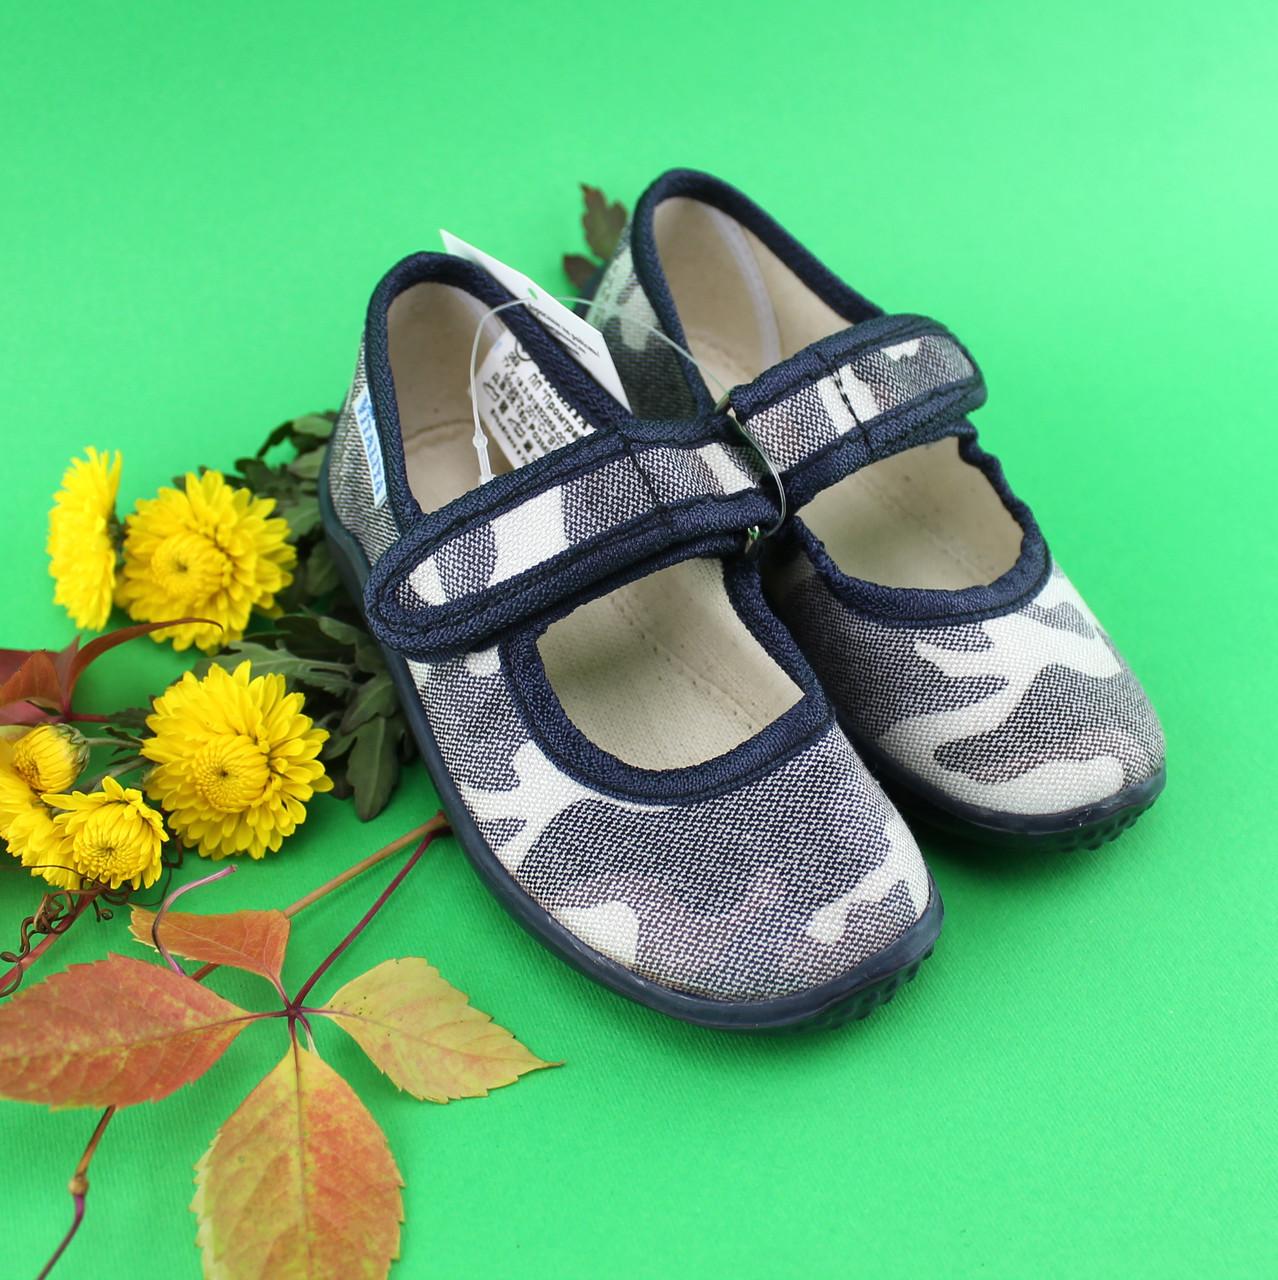 Тапочки оптом текстильная обувь Vitaliya Виталия производство Украина размер с 25,5 по 27